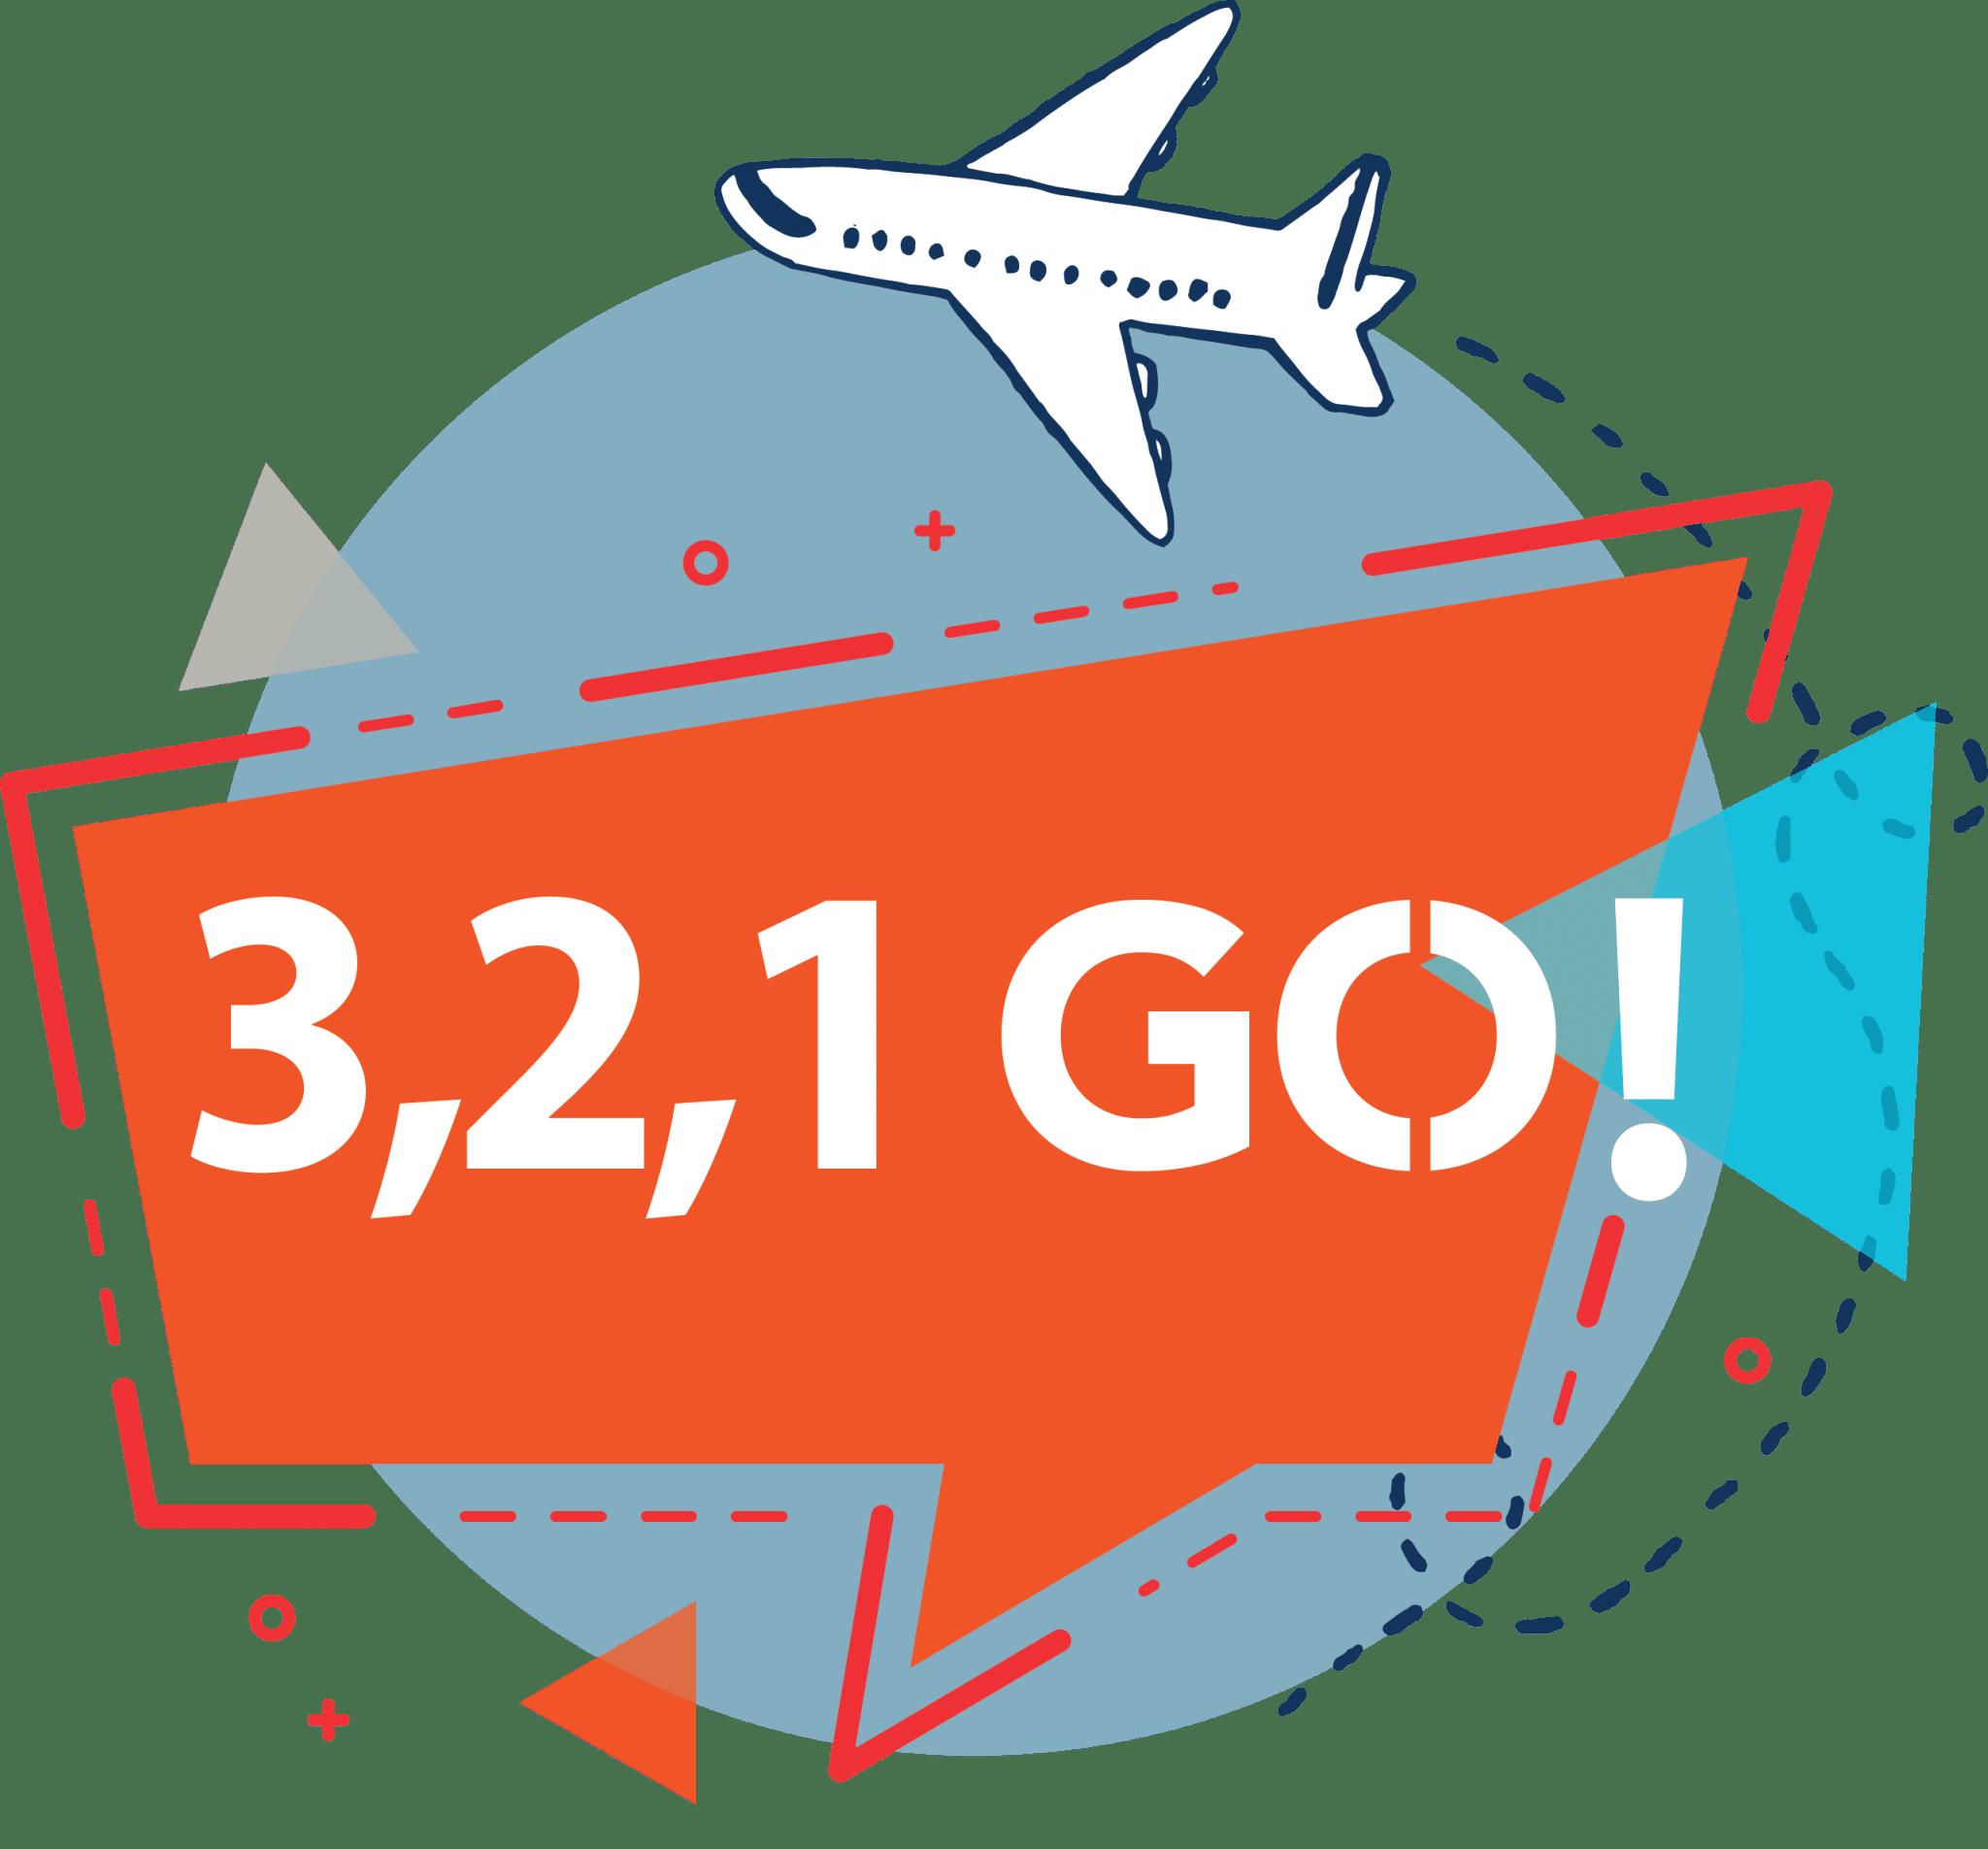 logo 3 2 1 go travel